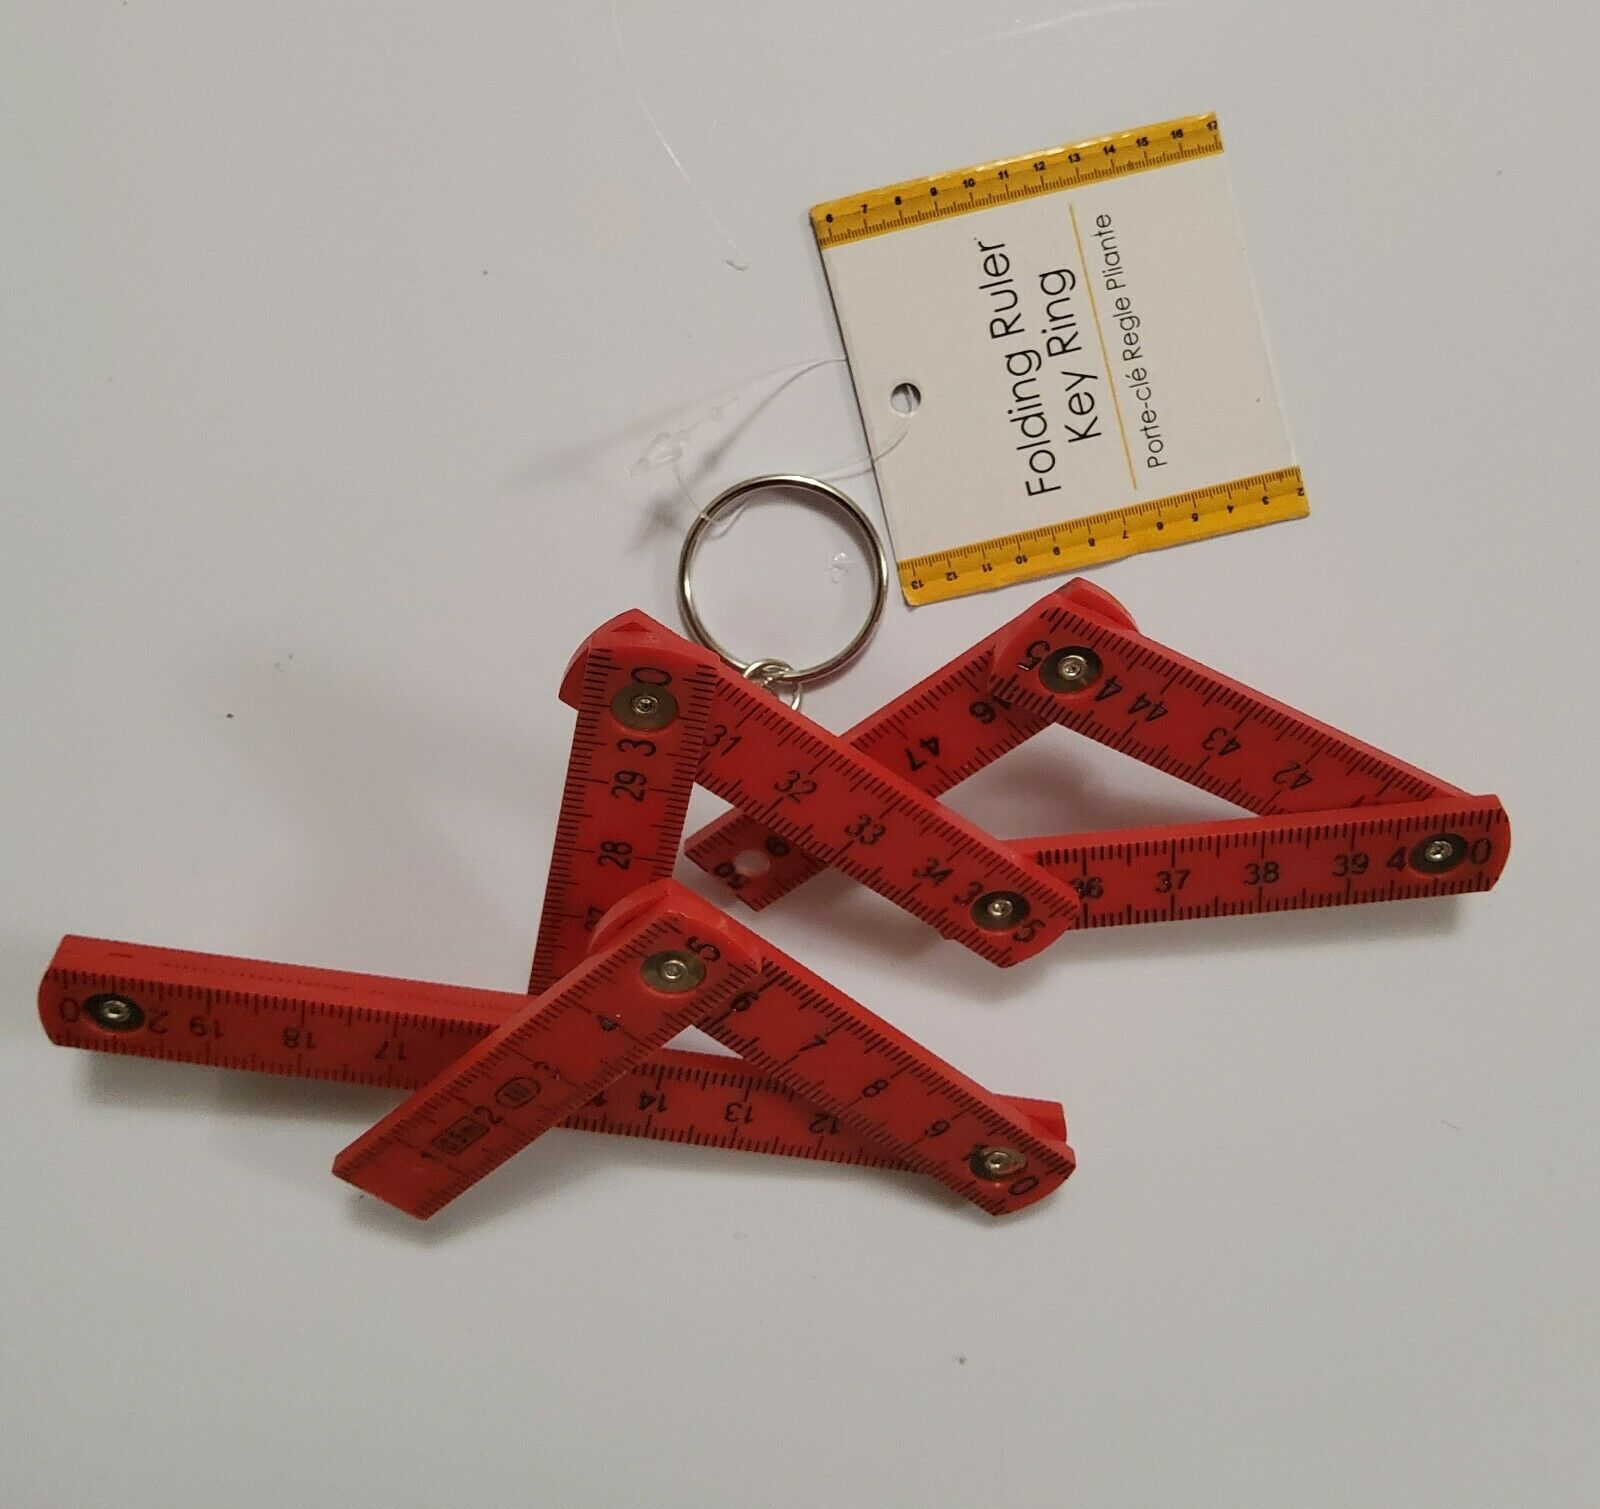 0.5M/5cm Mini Folding Traditional Carpenter Ruler Key Ring Assorted Colour (03)